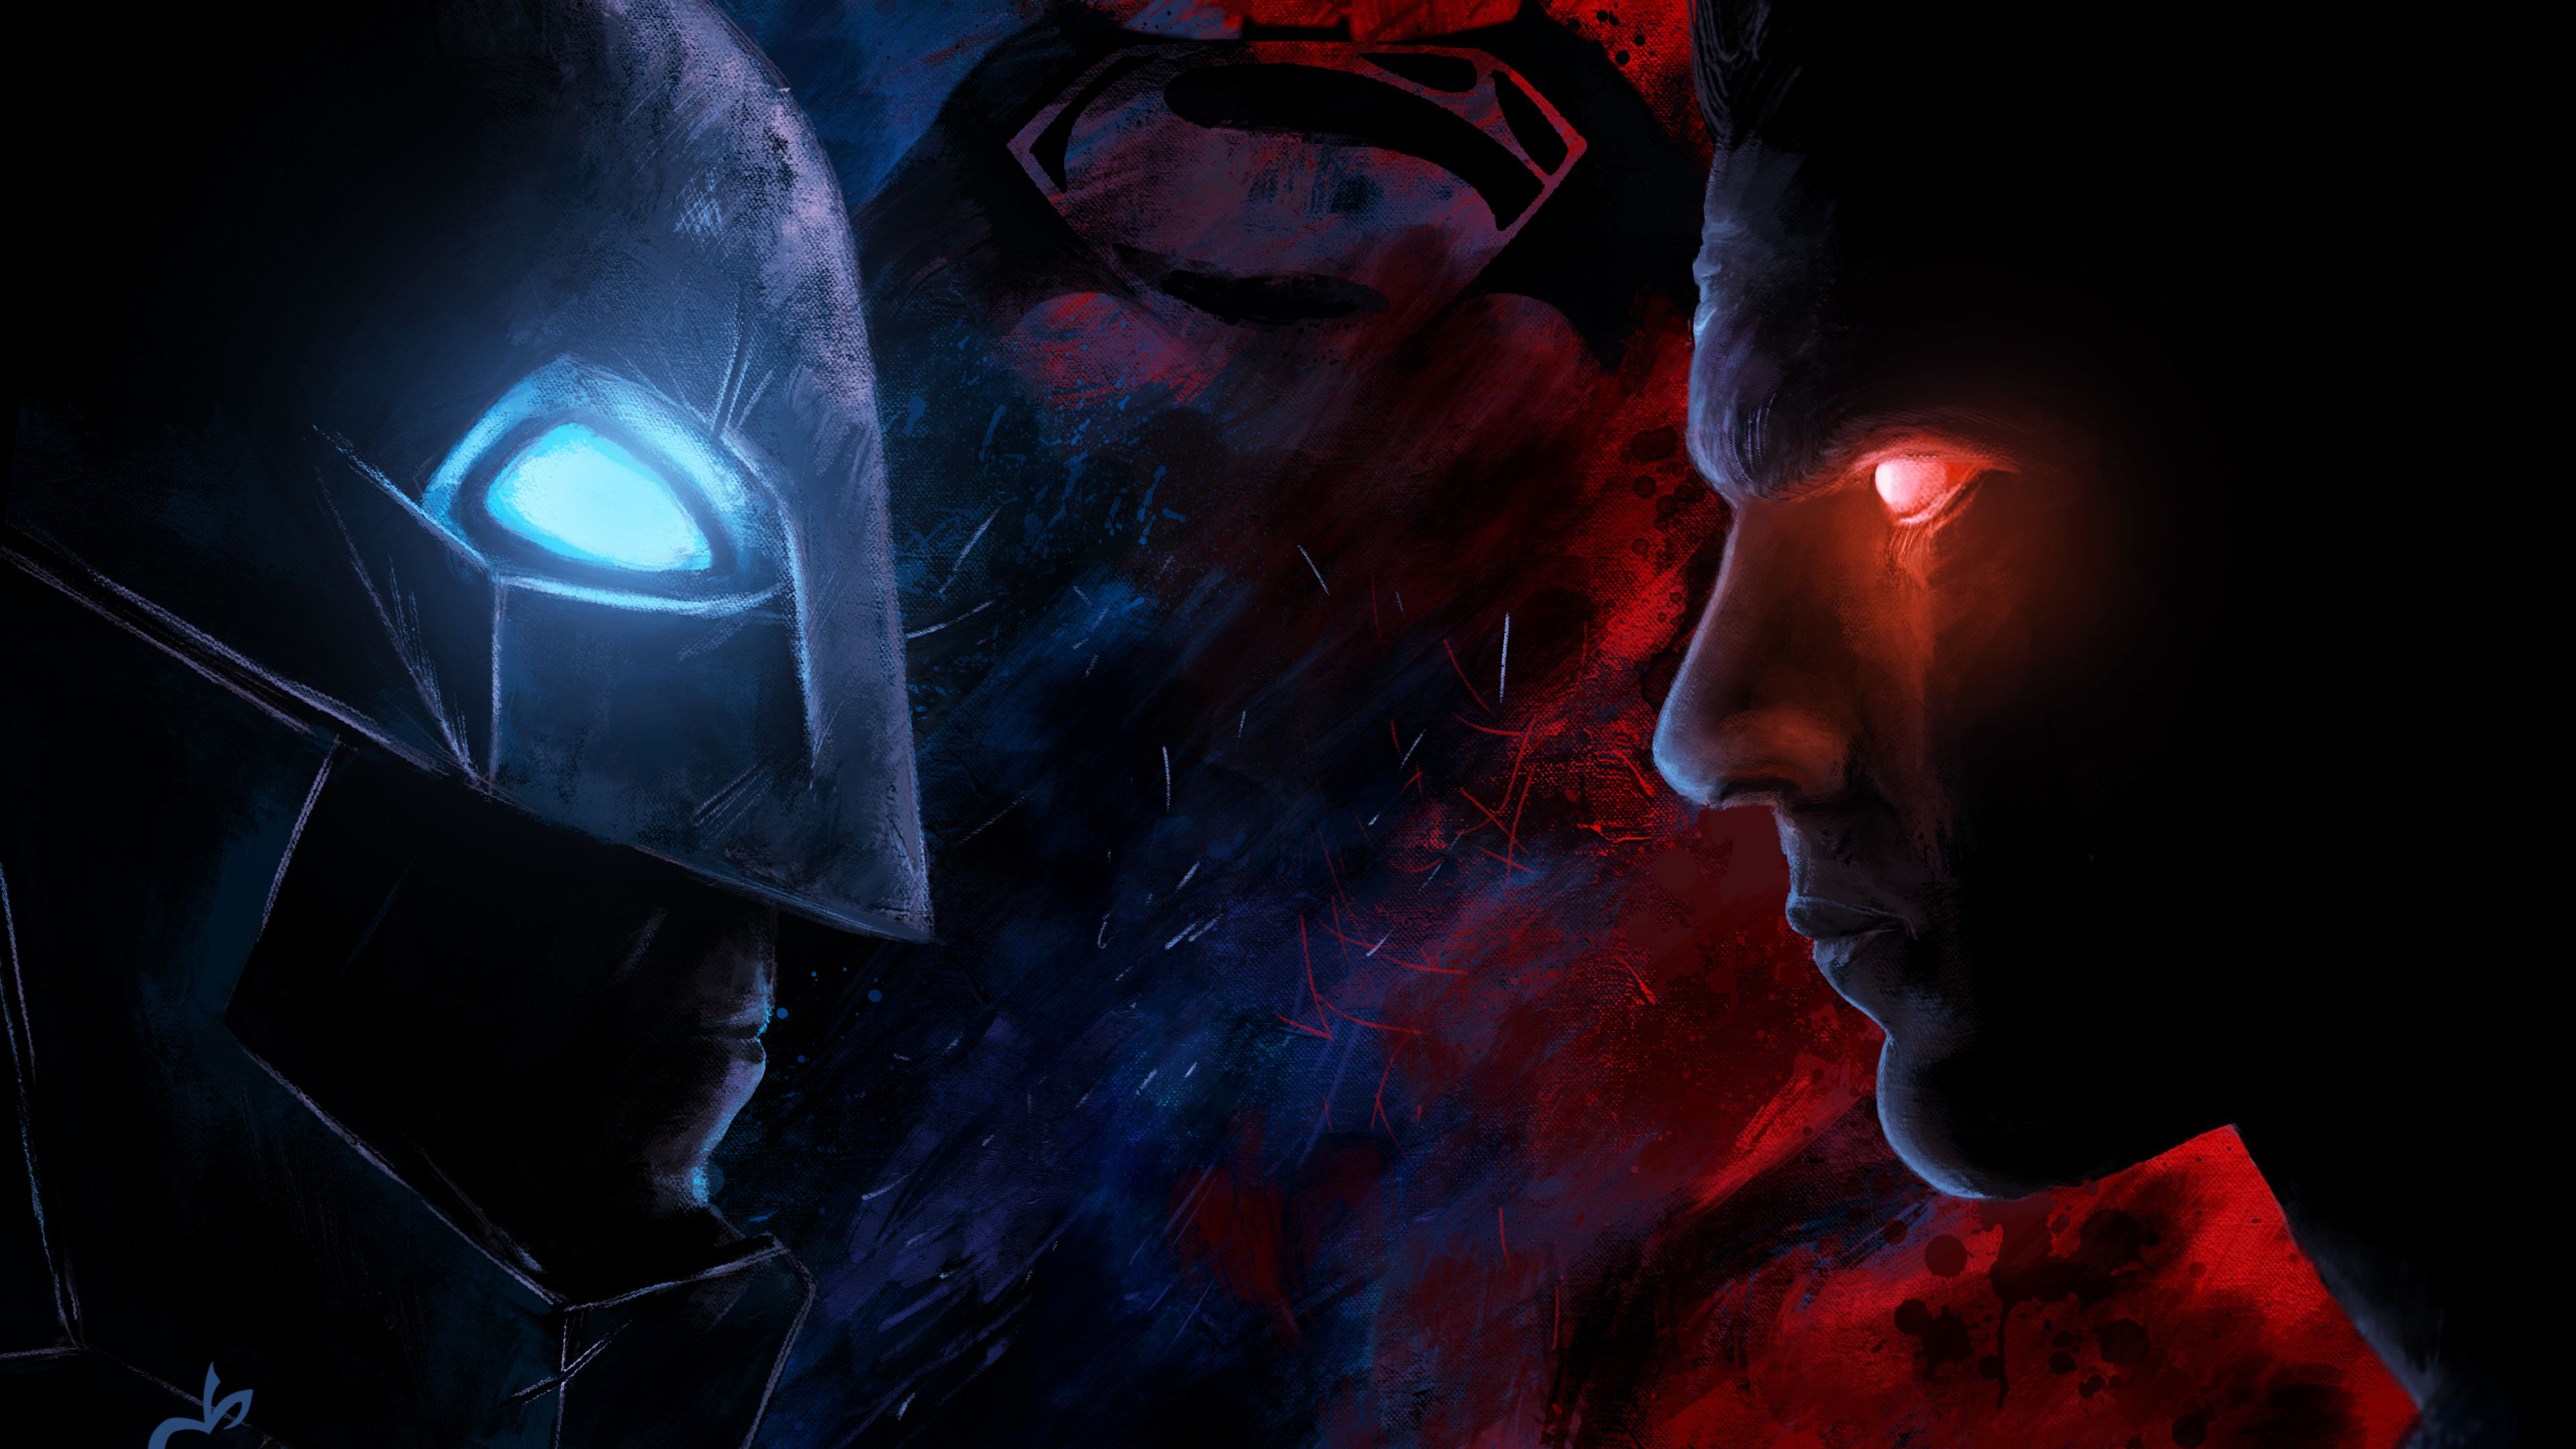 Batman Vs Superman Paint Artwork 4k Superman Wallpapers